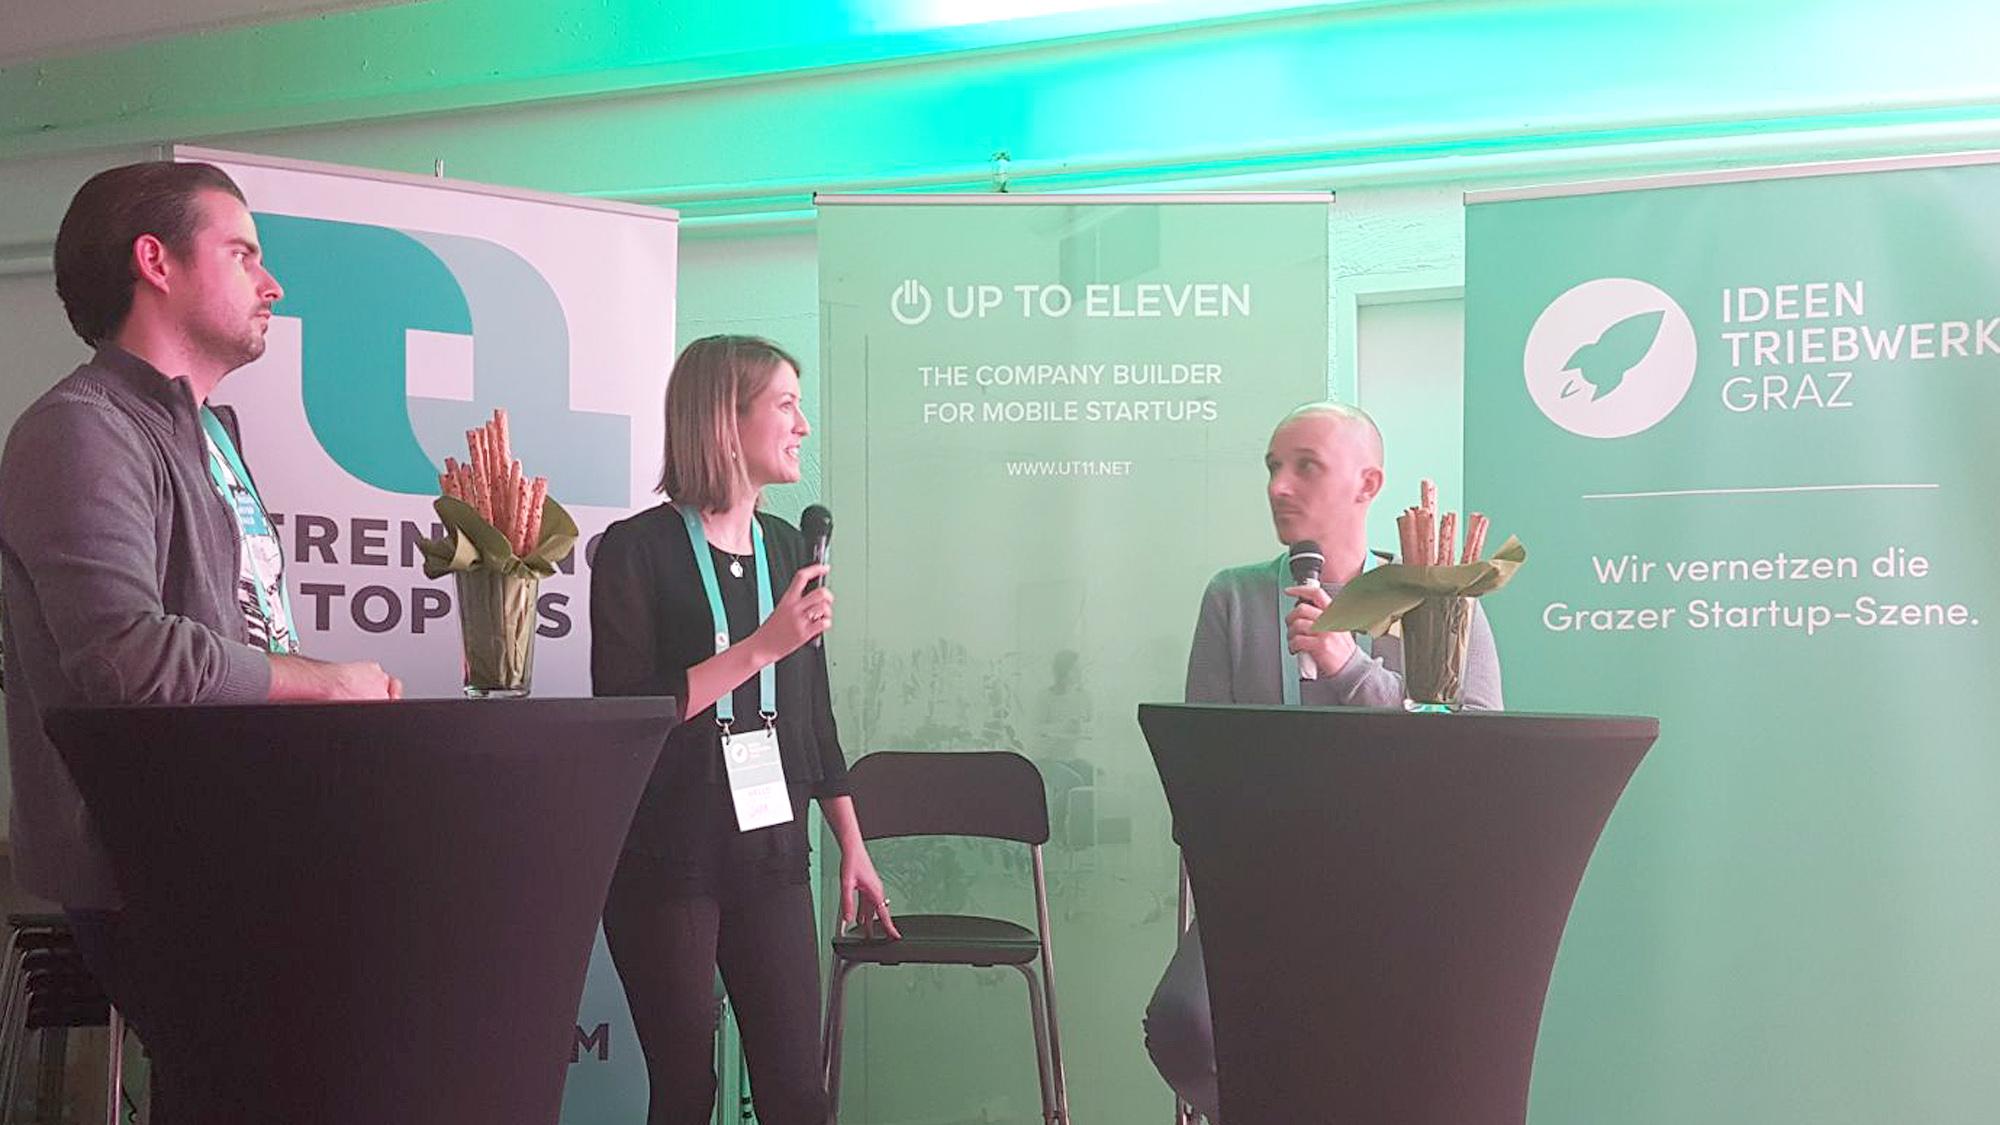 Diskussion mit Matthias Ruhri (Up to Eleven, Sara Grasel (Trending Topics) und Horst Eckstein (BiLLitii). (c) Trending Topics